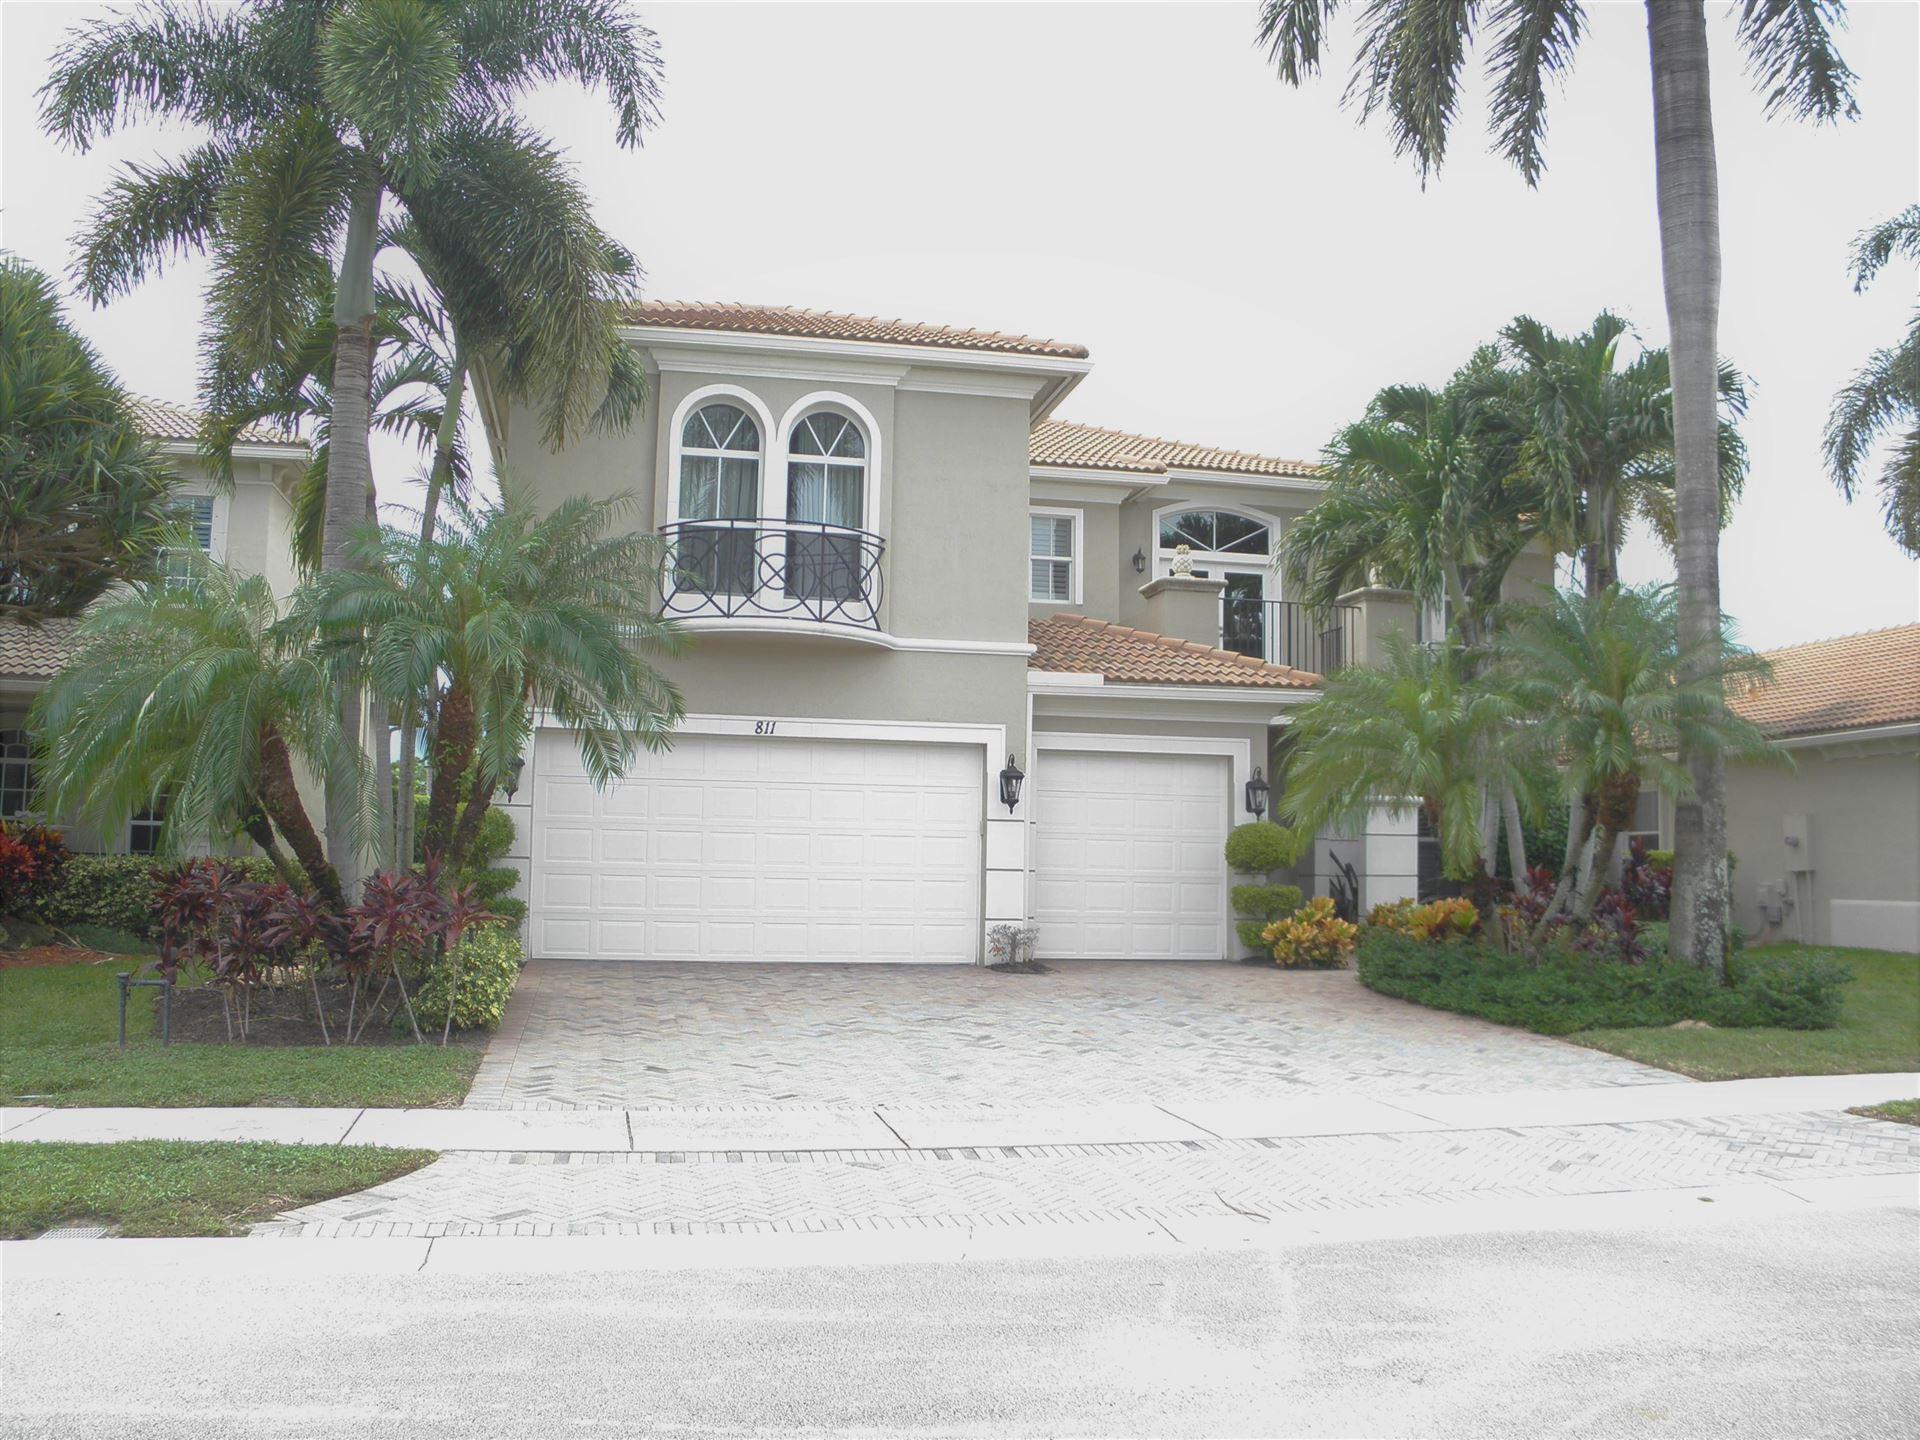 Photo of 811 Floret Drive, Palm Beach Gardens, FL 33410 (MLS # RX-10663973)